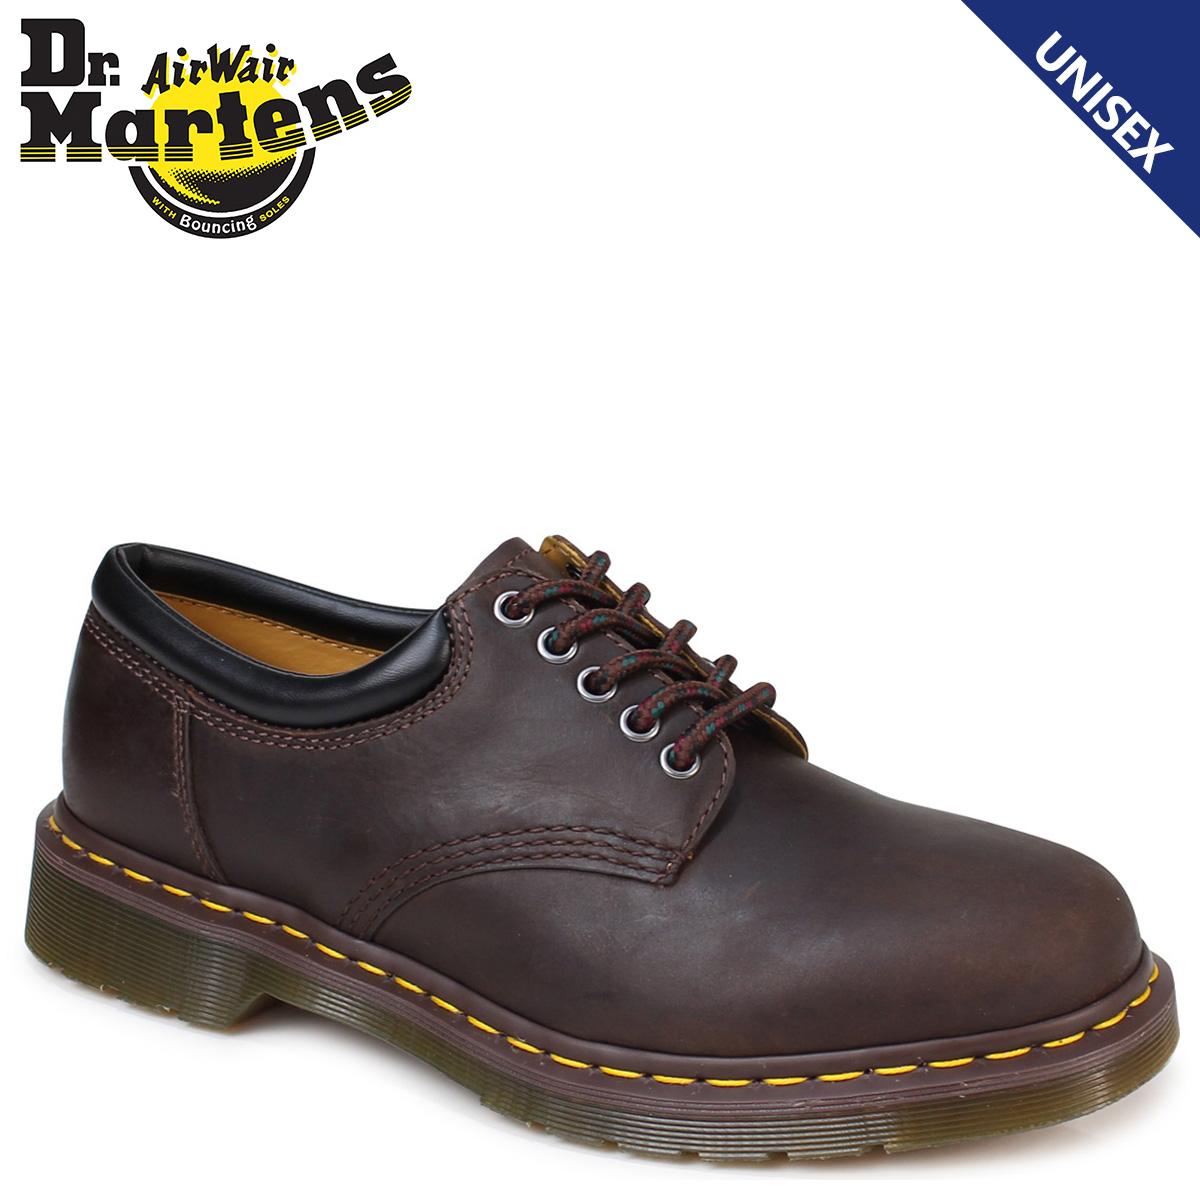 博士顿 Dr.Martens 5 厅鞋 R11849201 8053 皮革男性女性